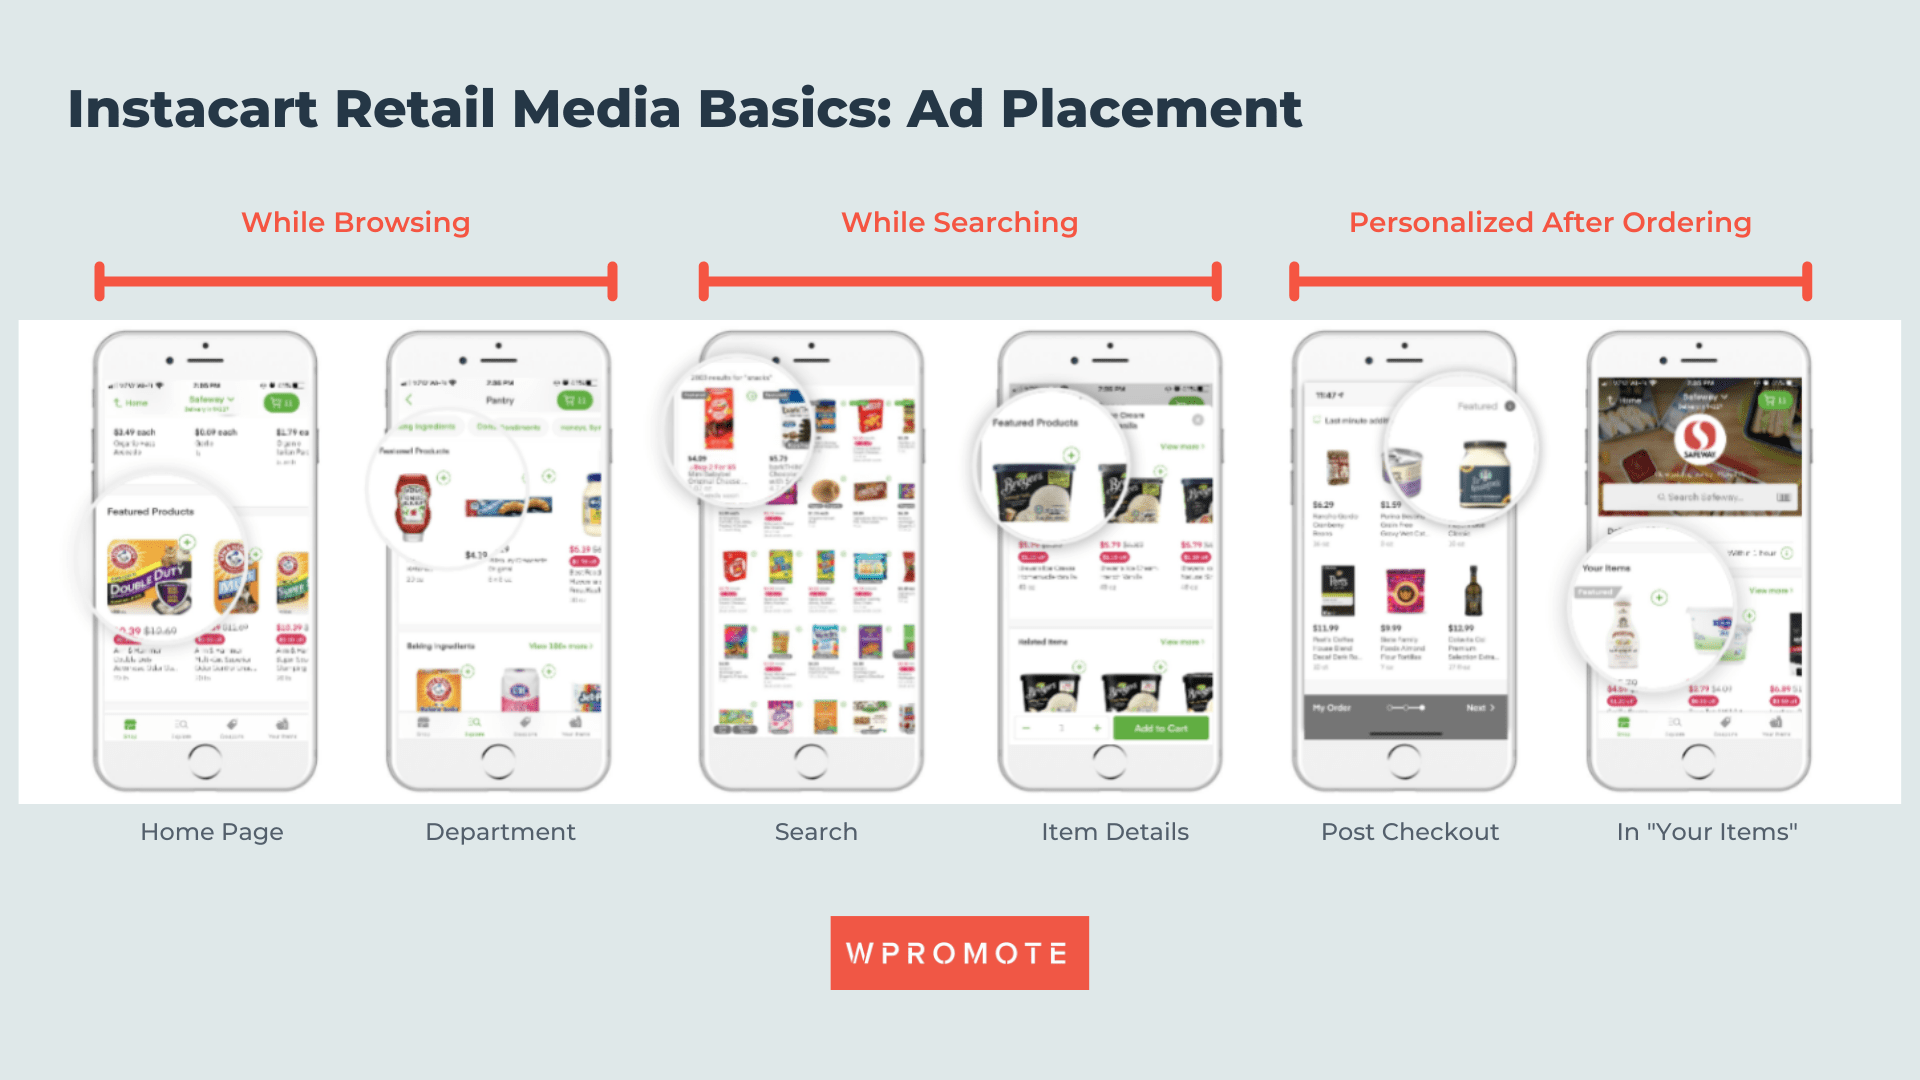 Instacart Retail Media Basics: Ad Placement